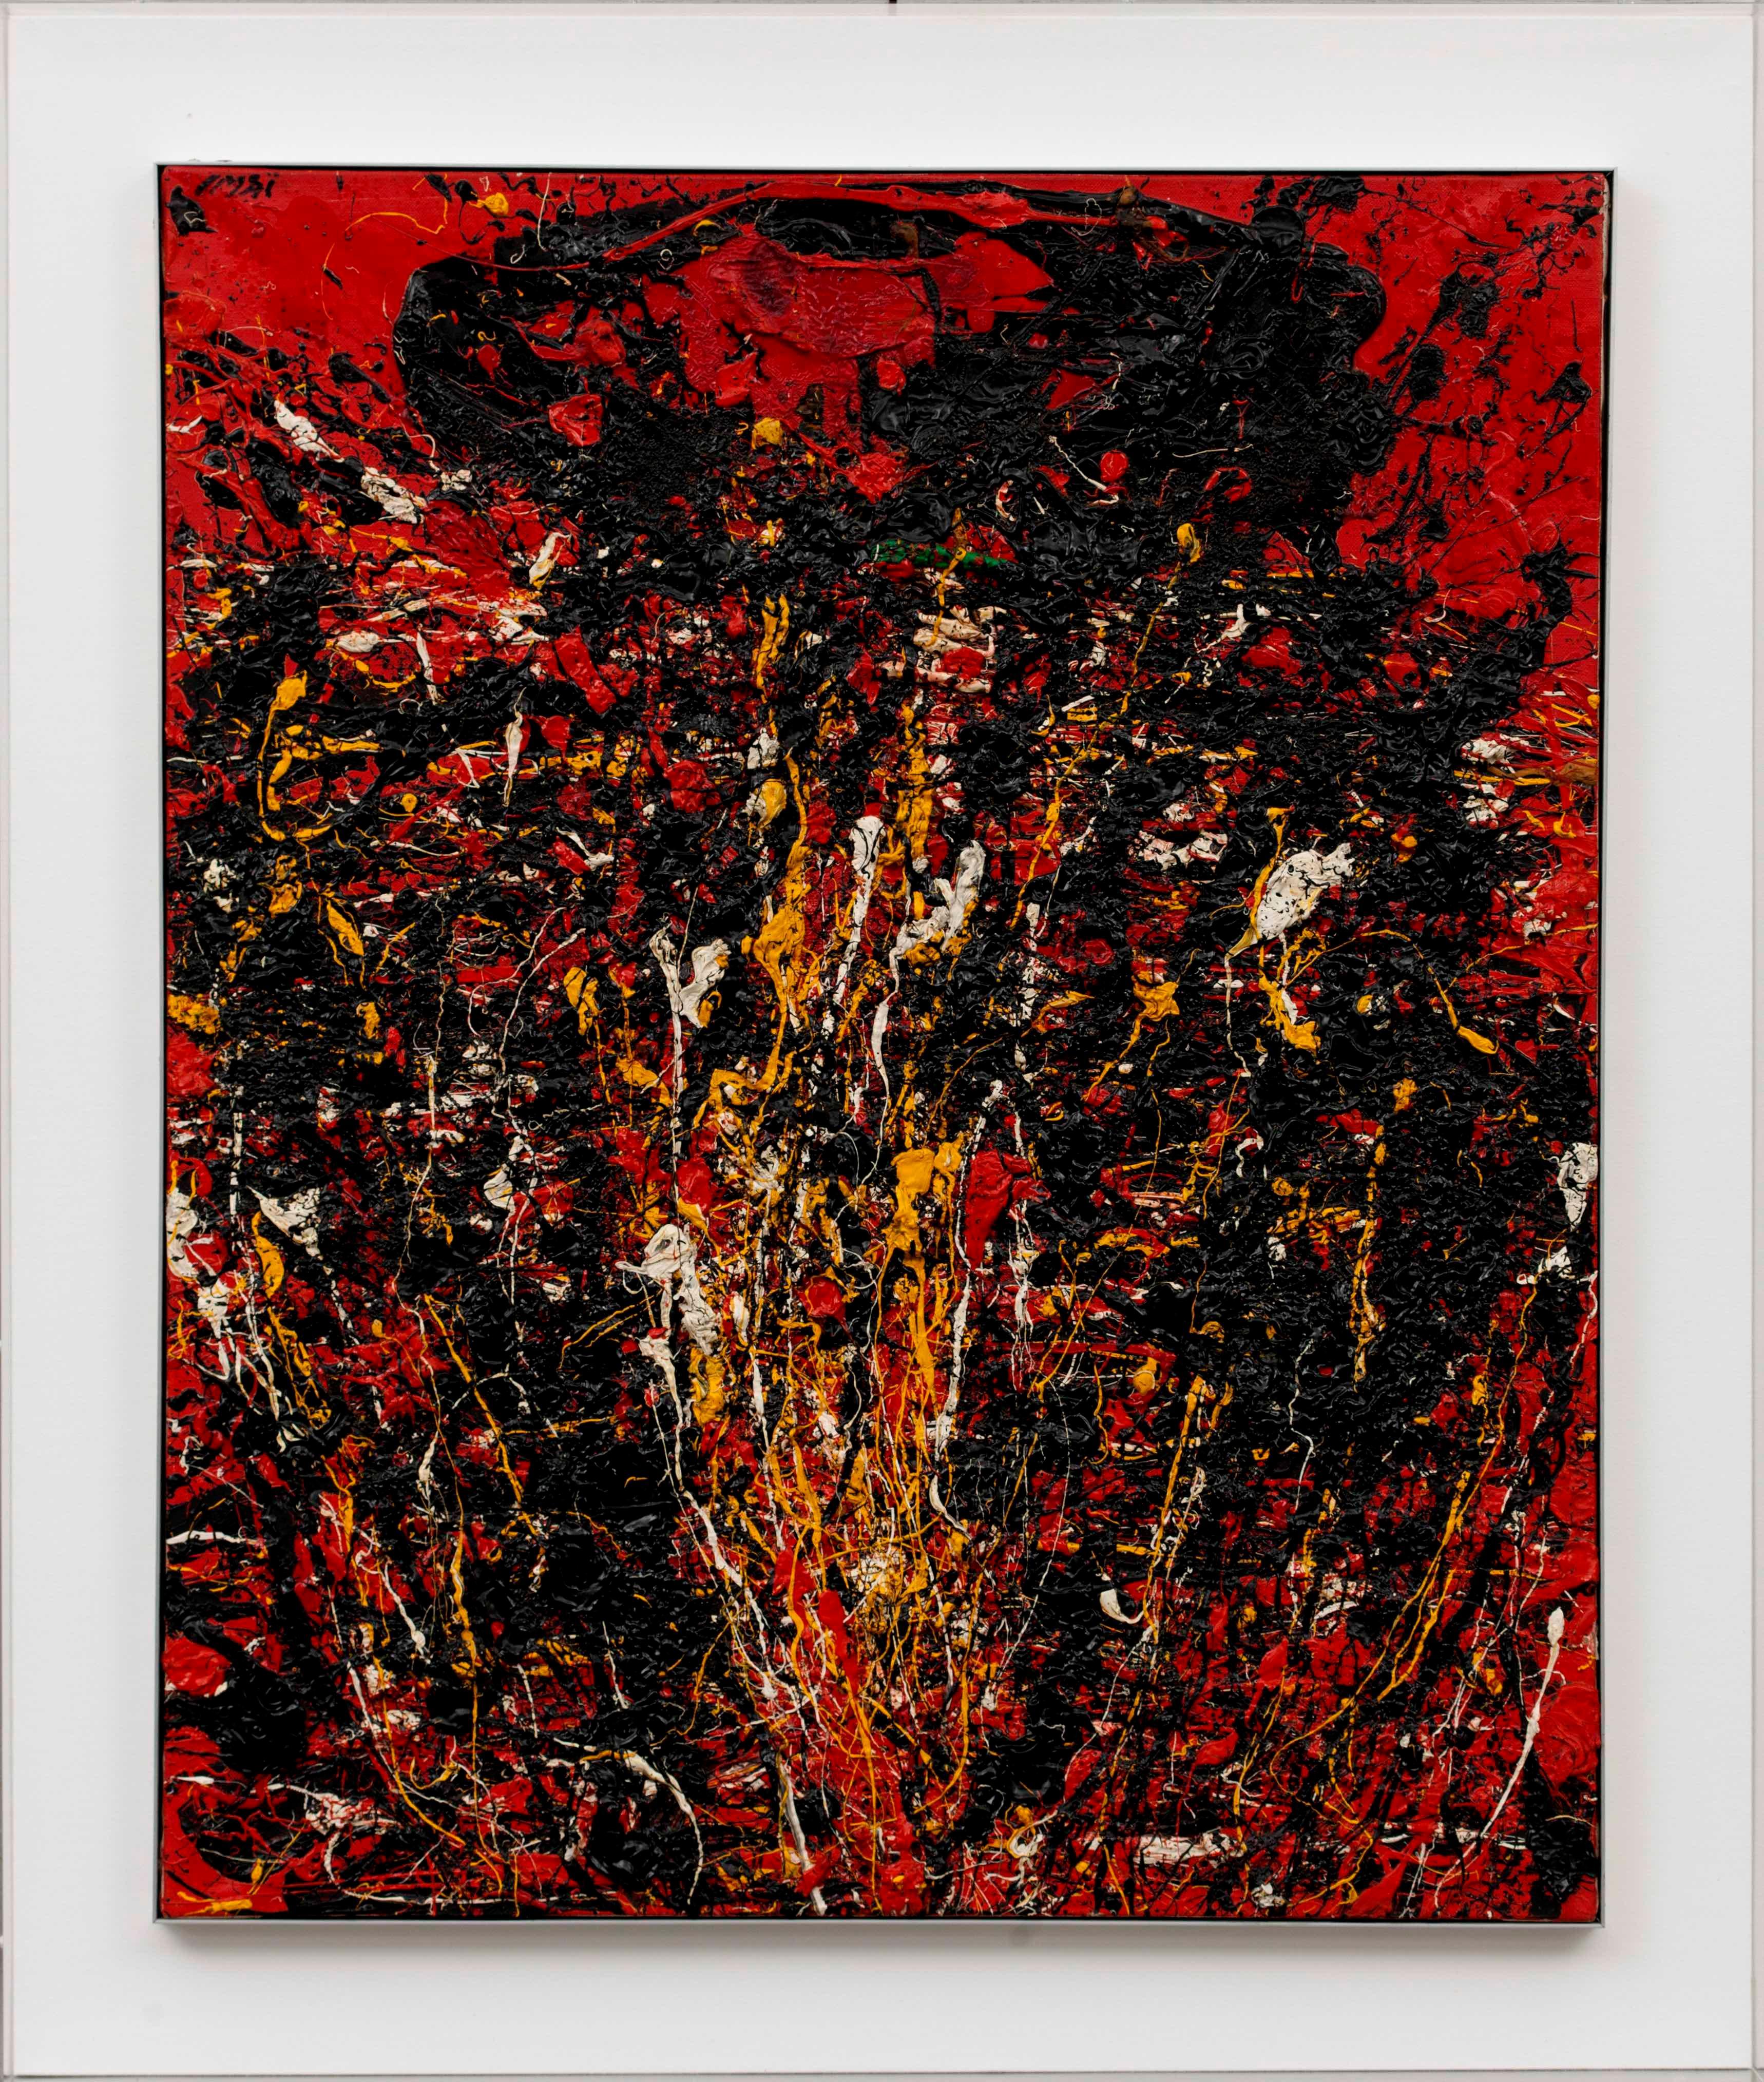 Soleil Fendu by TOSHIMITSU ÏMAI - Abstract, Oil painting, Art Informel Movement